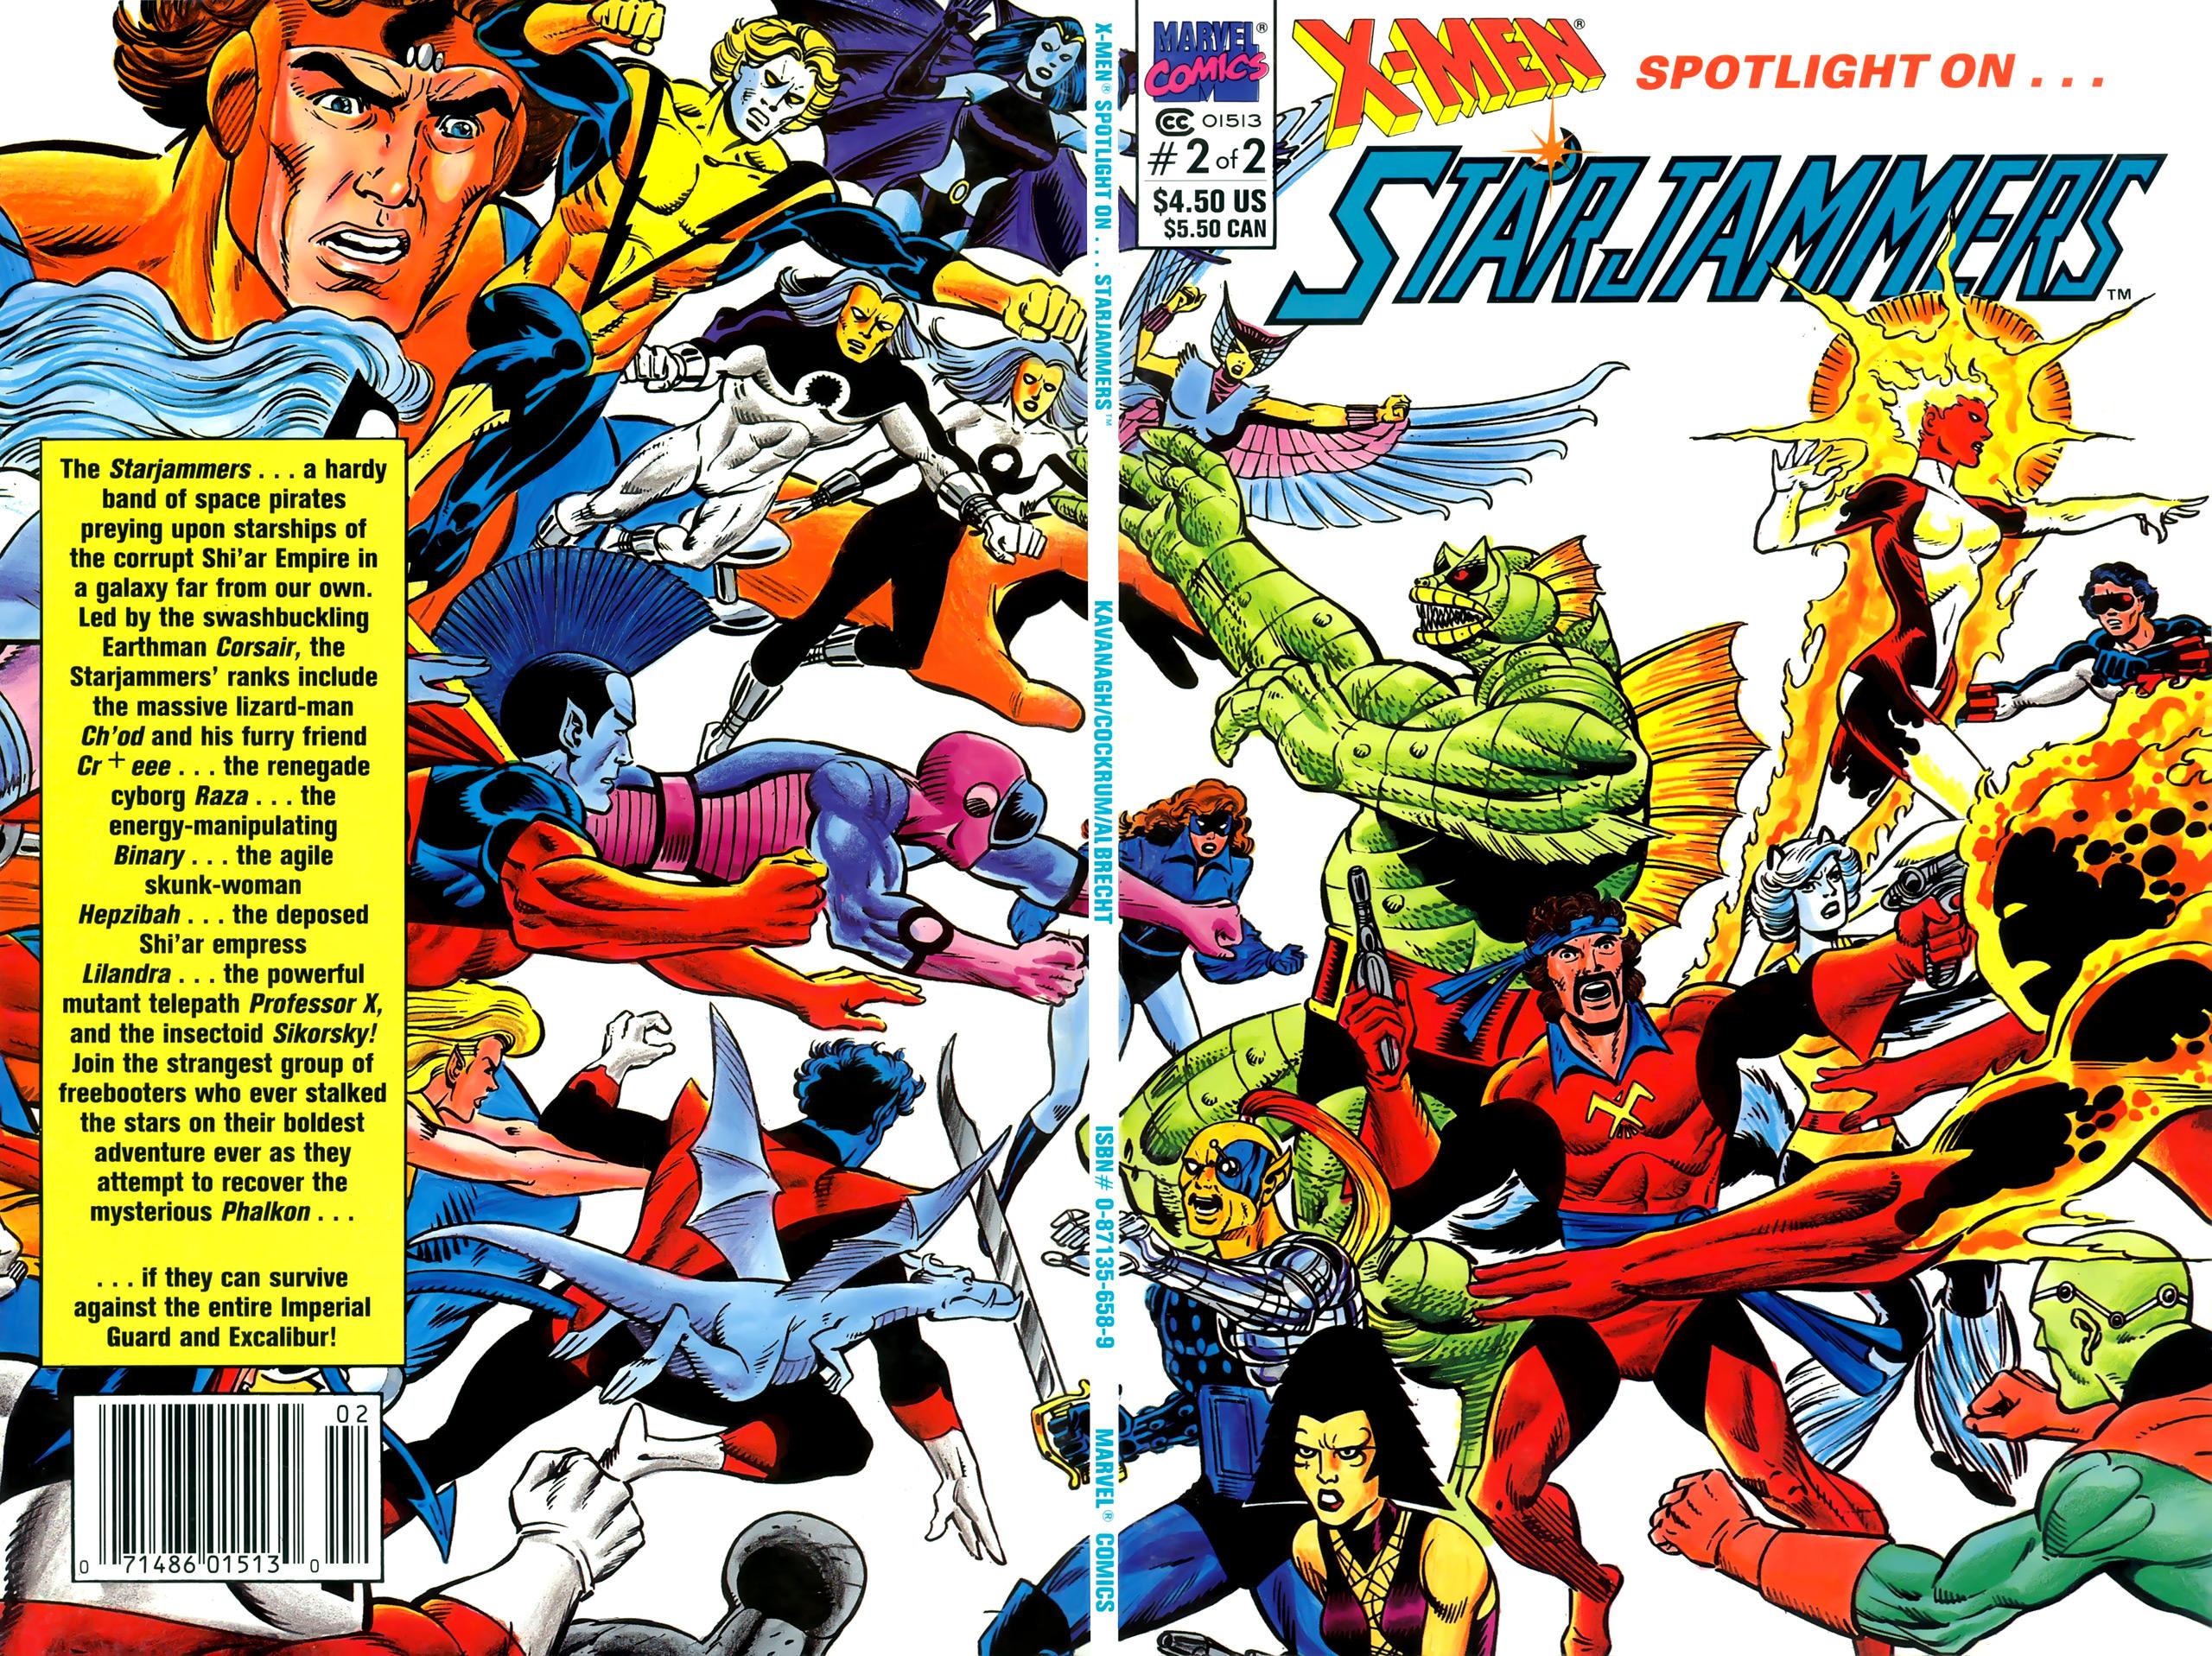 X-Men Spotlight On...Starjammers 2 Page 1